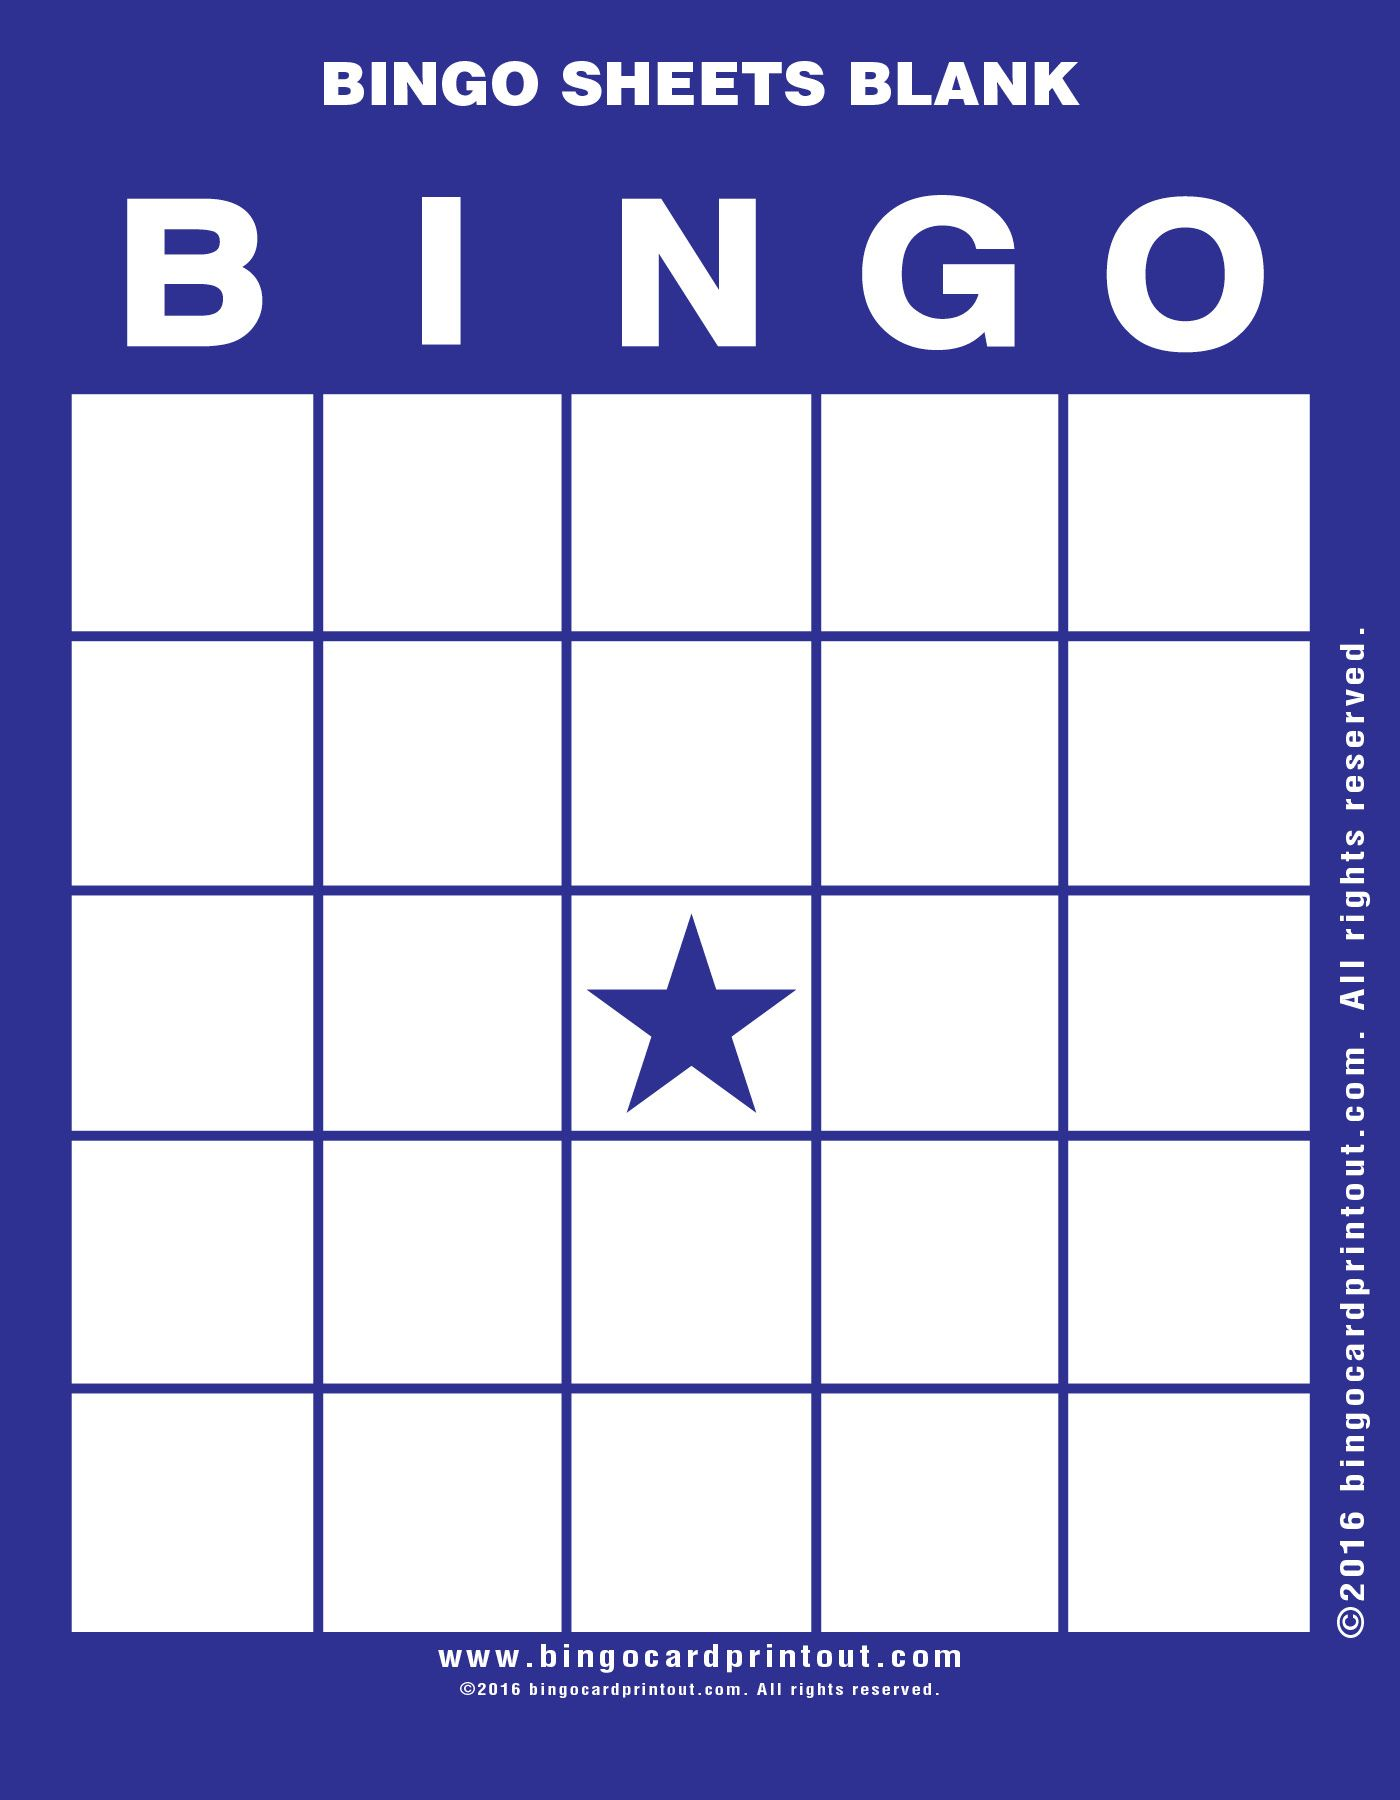 Bingo Sheets Blank 6 Bingo Sheets Blank Pinterest Bingo Sheets